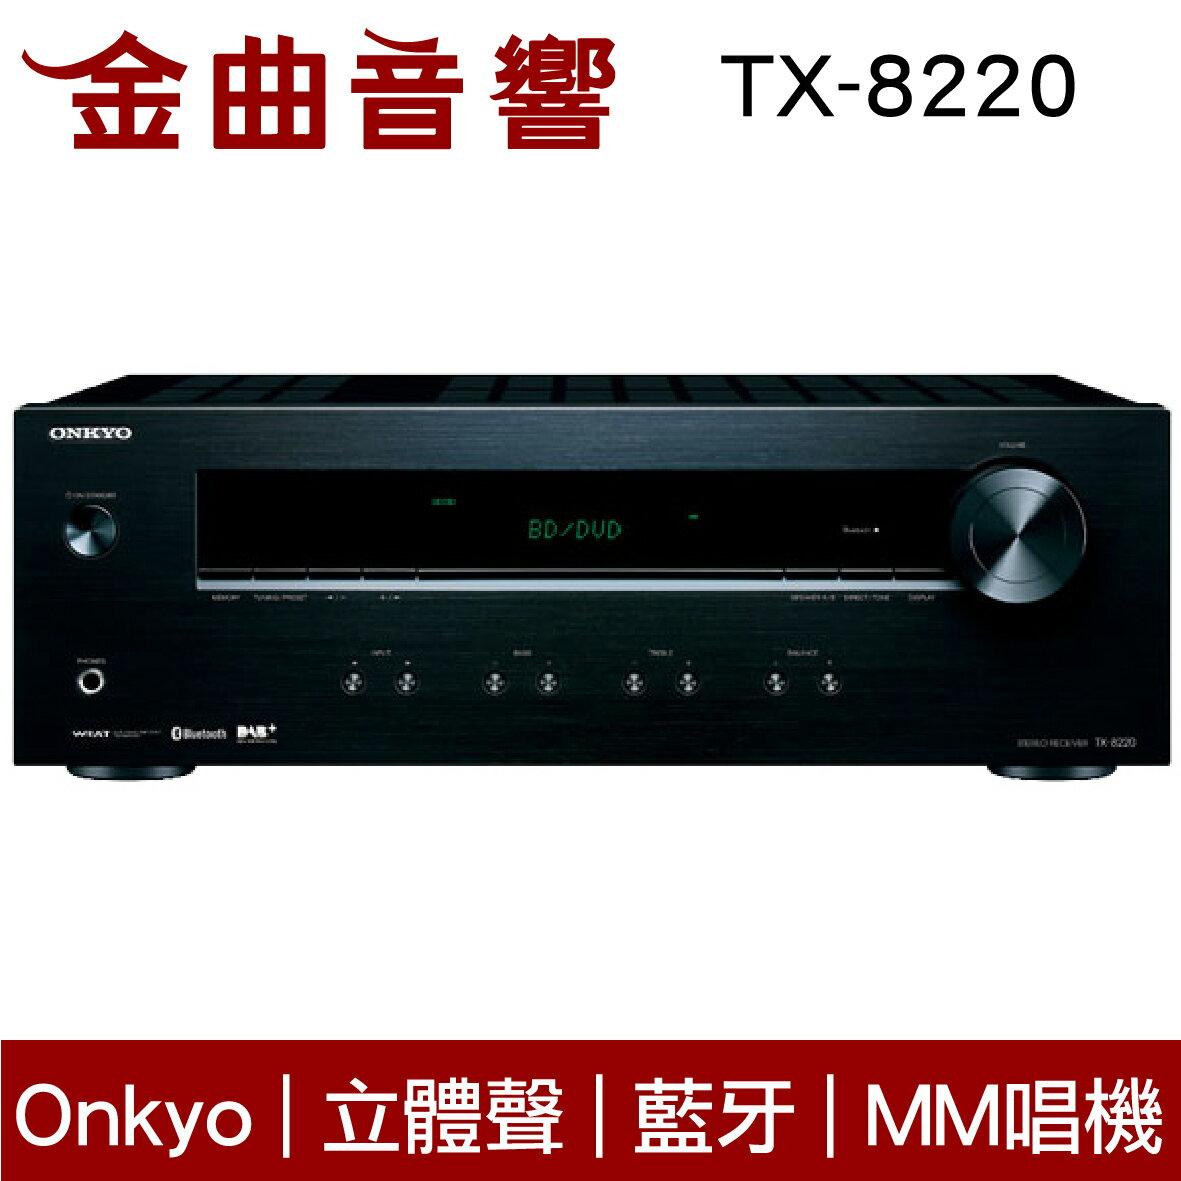 Onkyo 安橋 TX-8220 立體聲 收音 擴大機 | 金曲音響